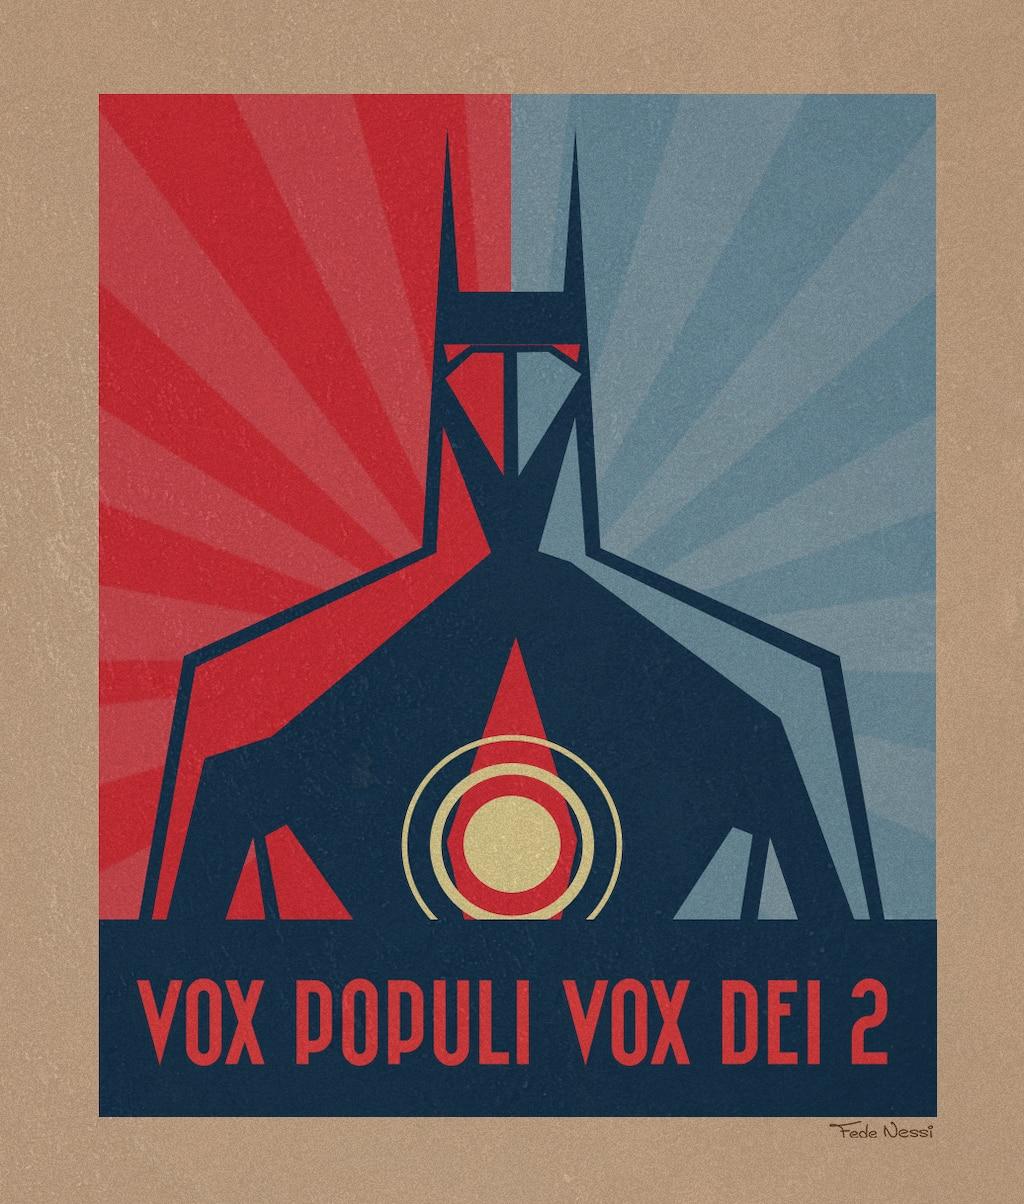 Steam Community Vox Populi Vox Dei 2